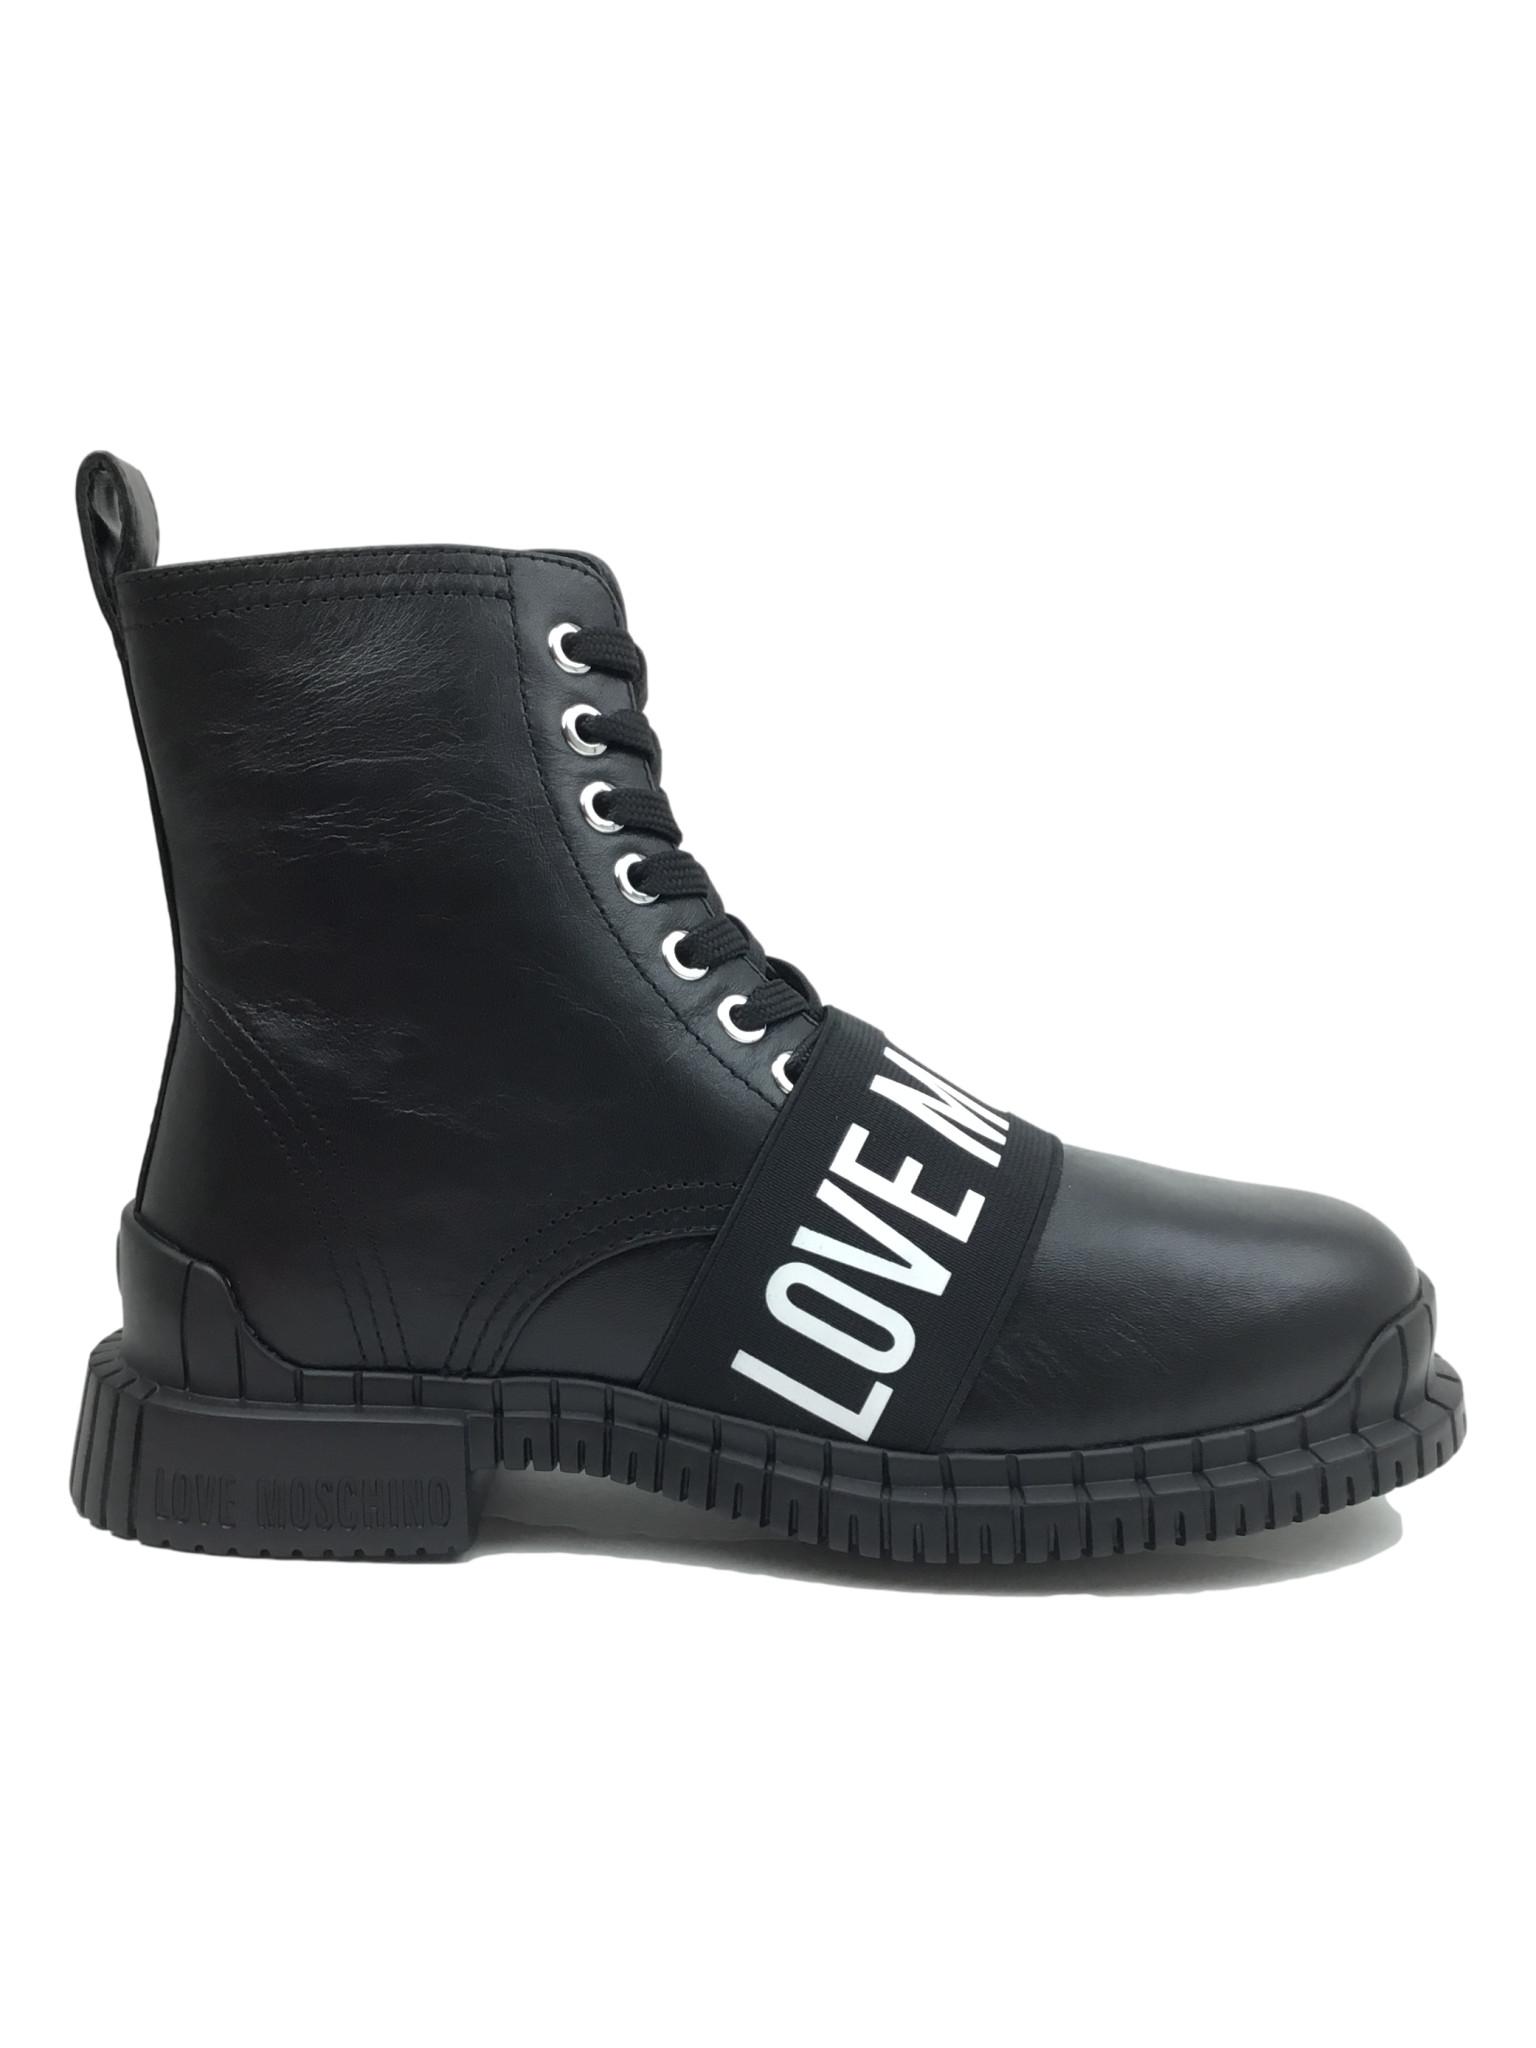 Love Moschino Boots Black